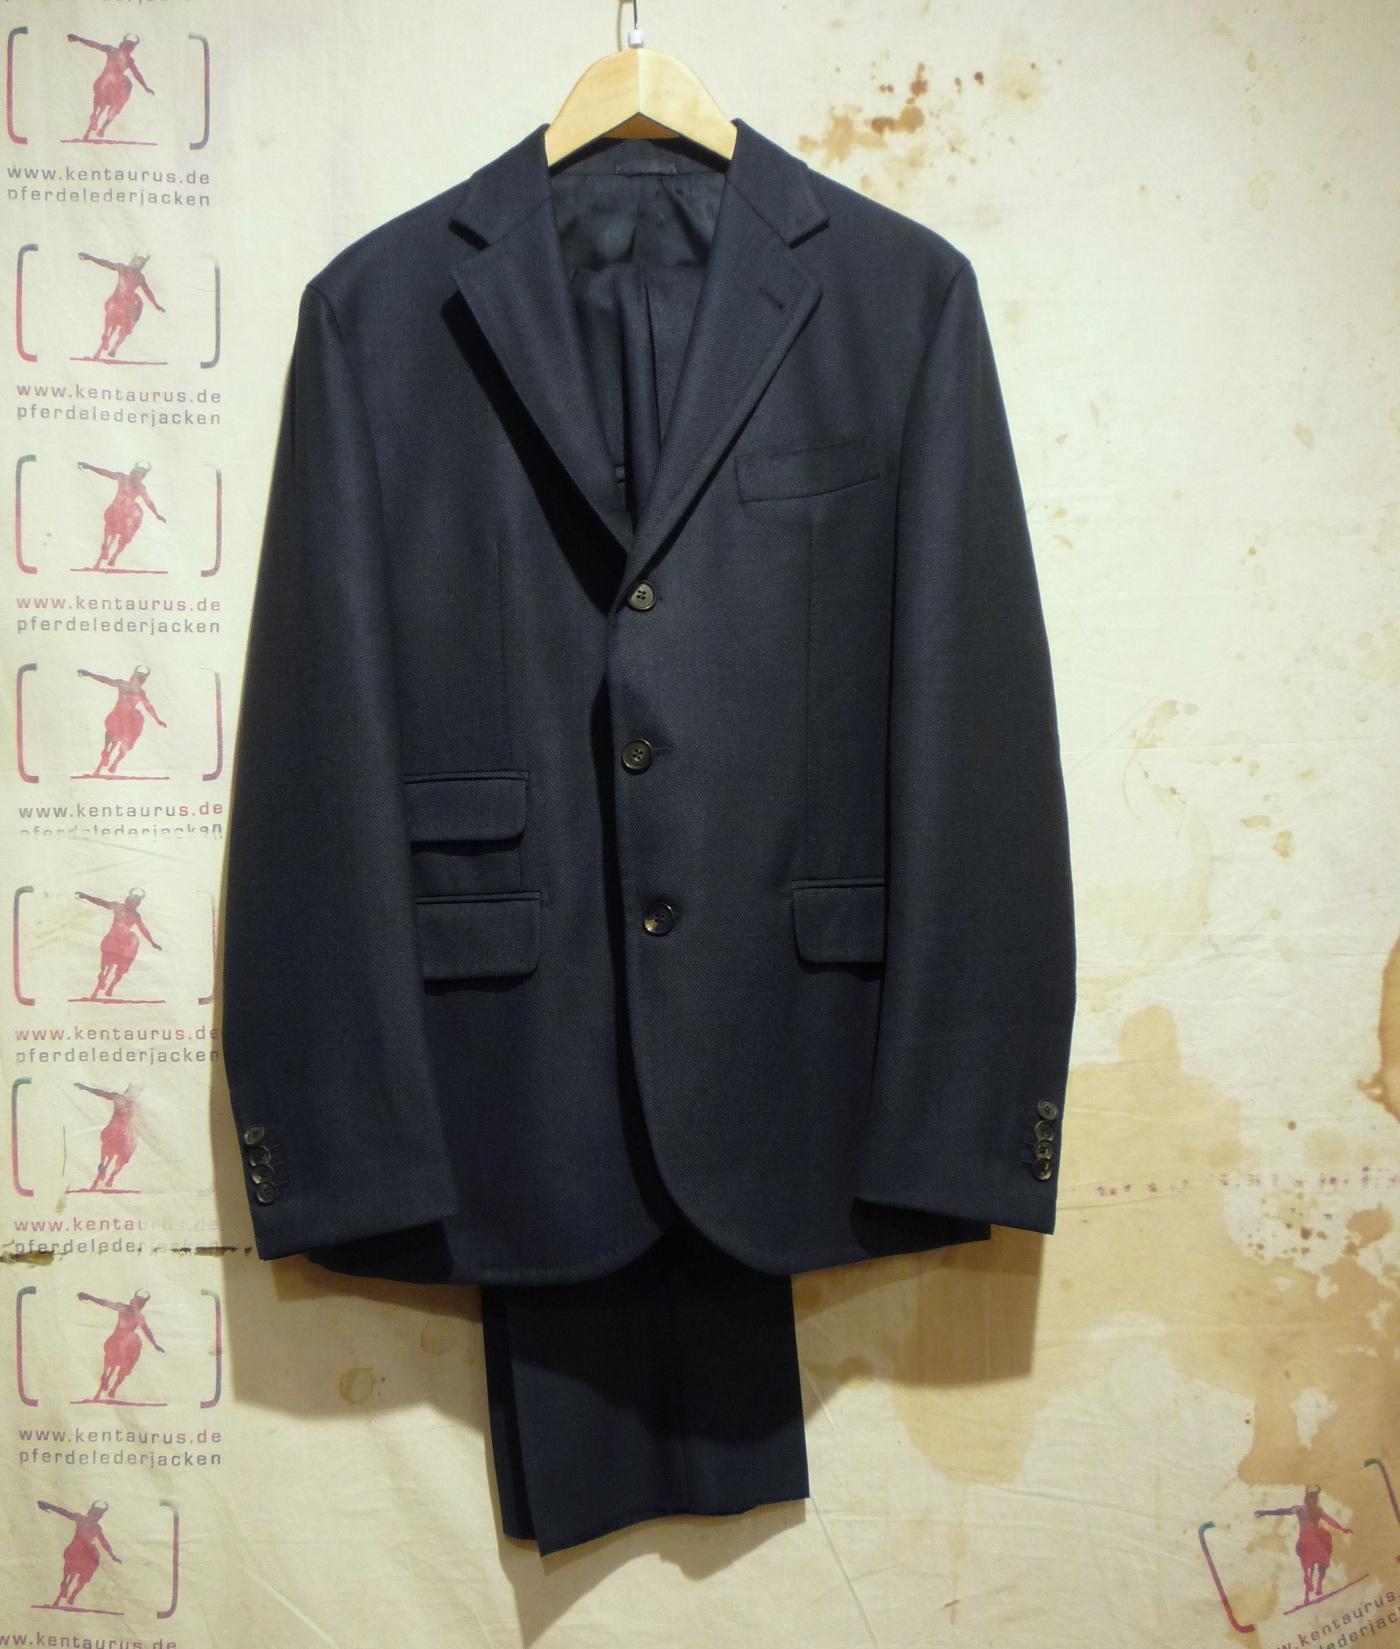 S.Piccolo blue wool suit